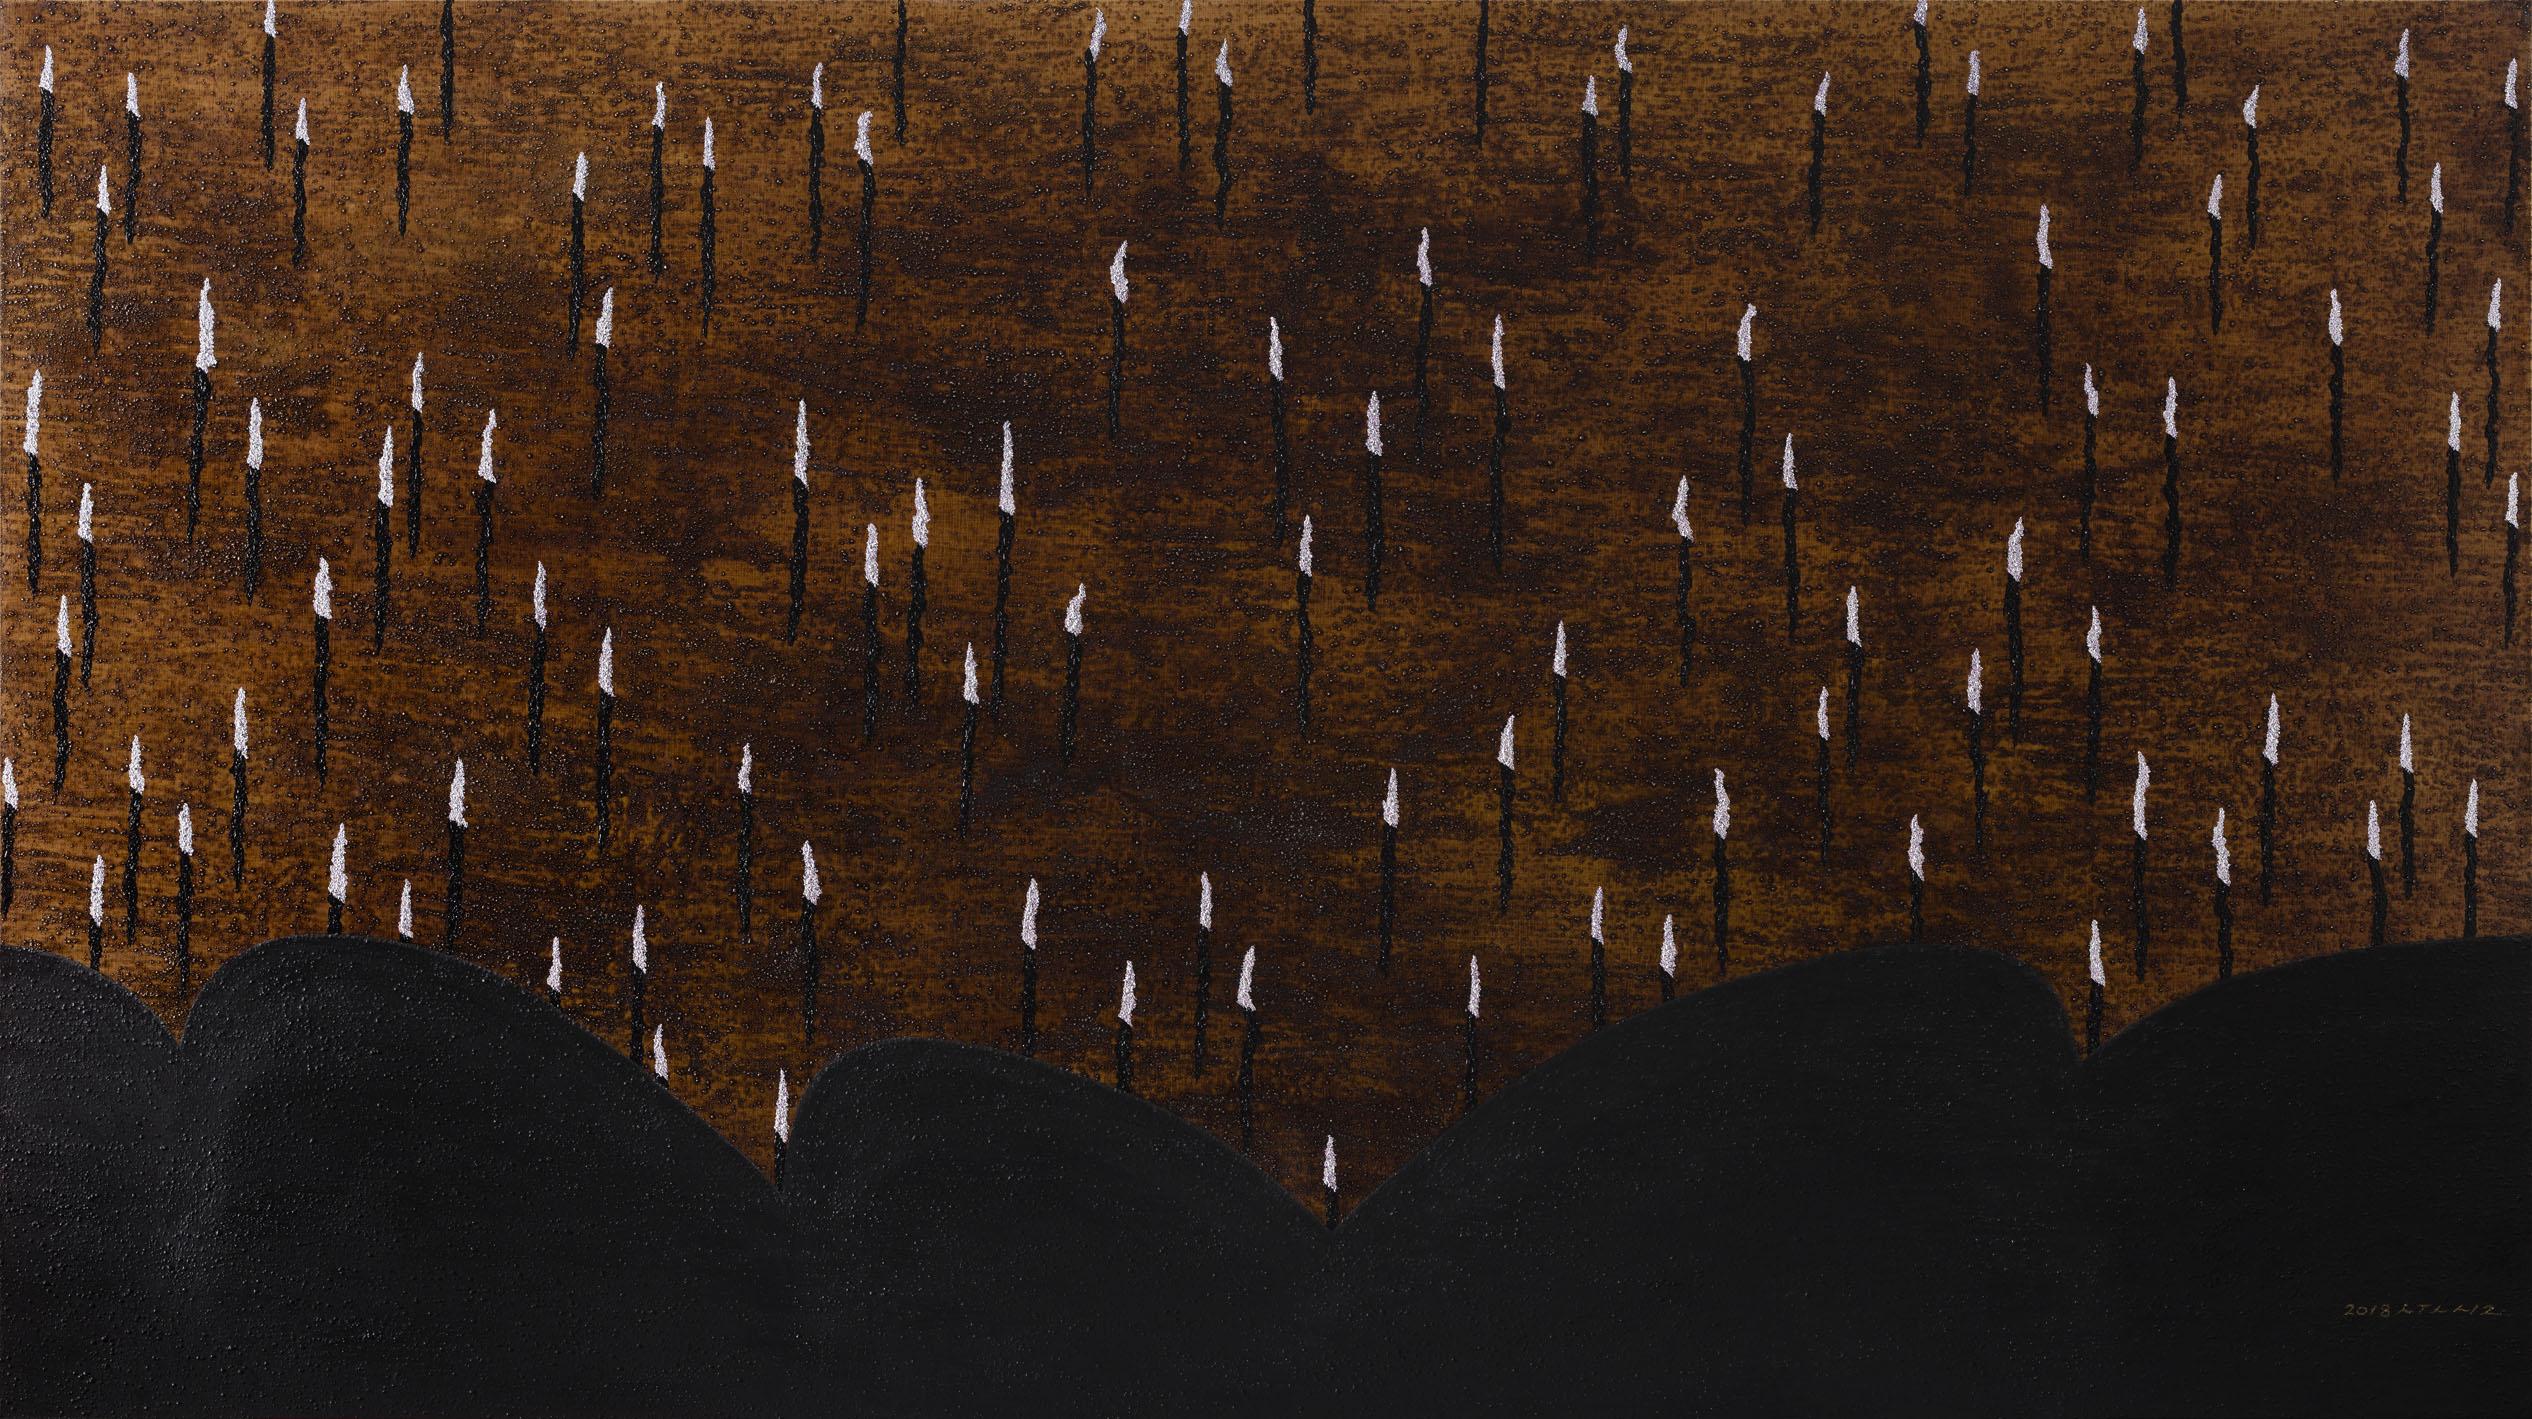 Ode to Music 1814_브람스 교향곡 제 4번 E단조 op.98_150x270cm_Acrylic and oil on canvas_2018.jpg